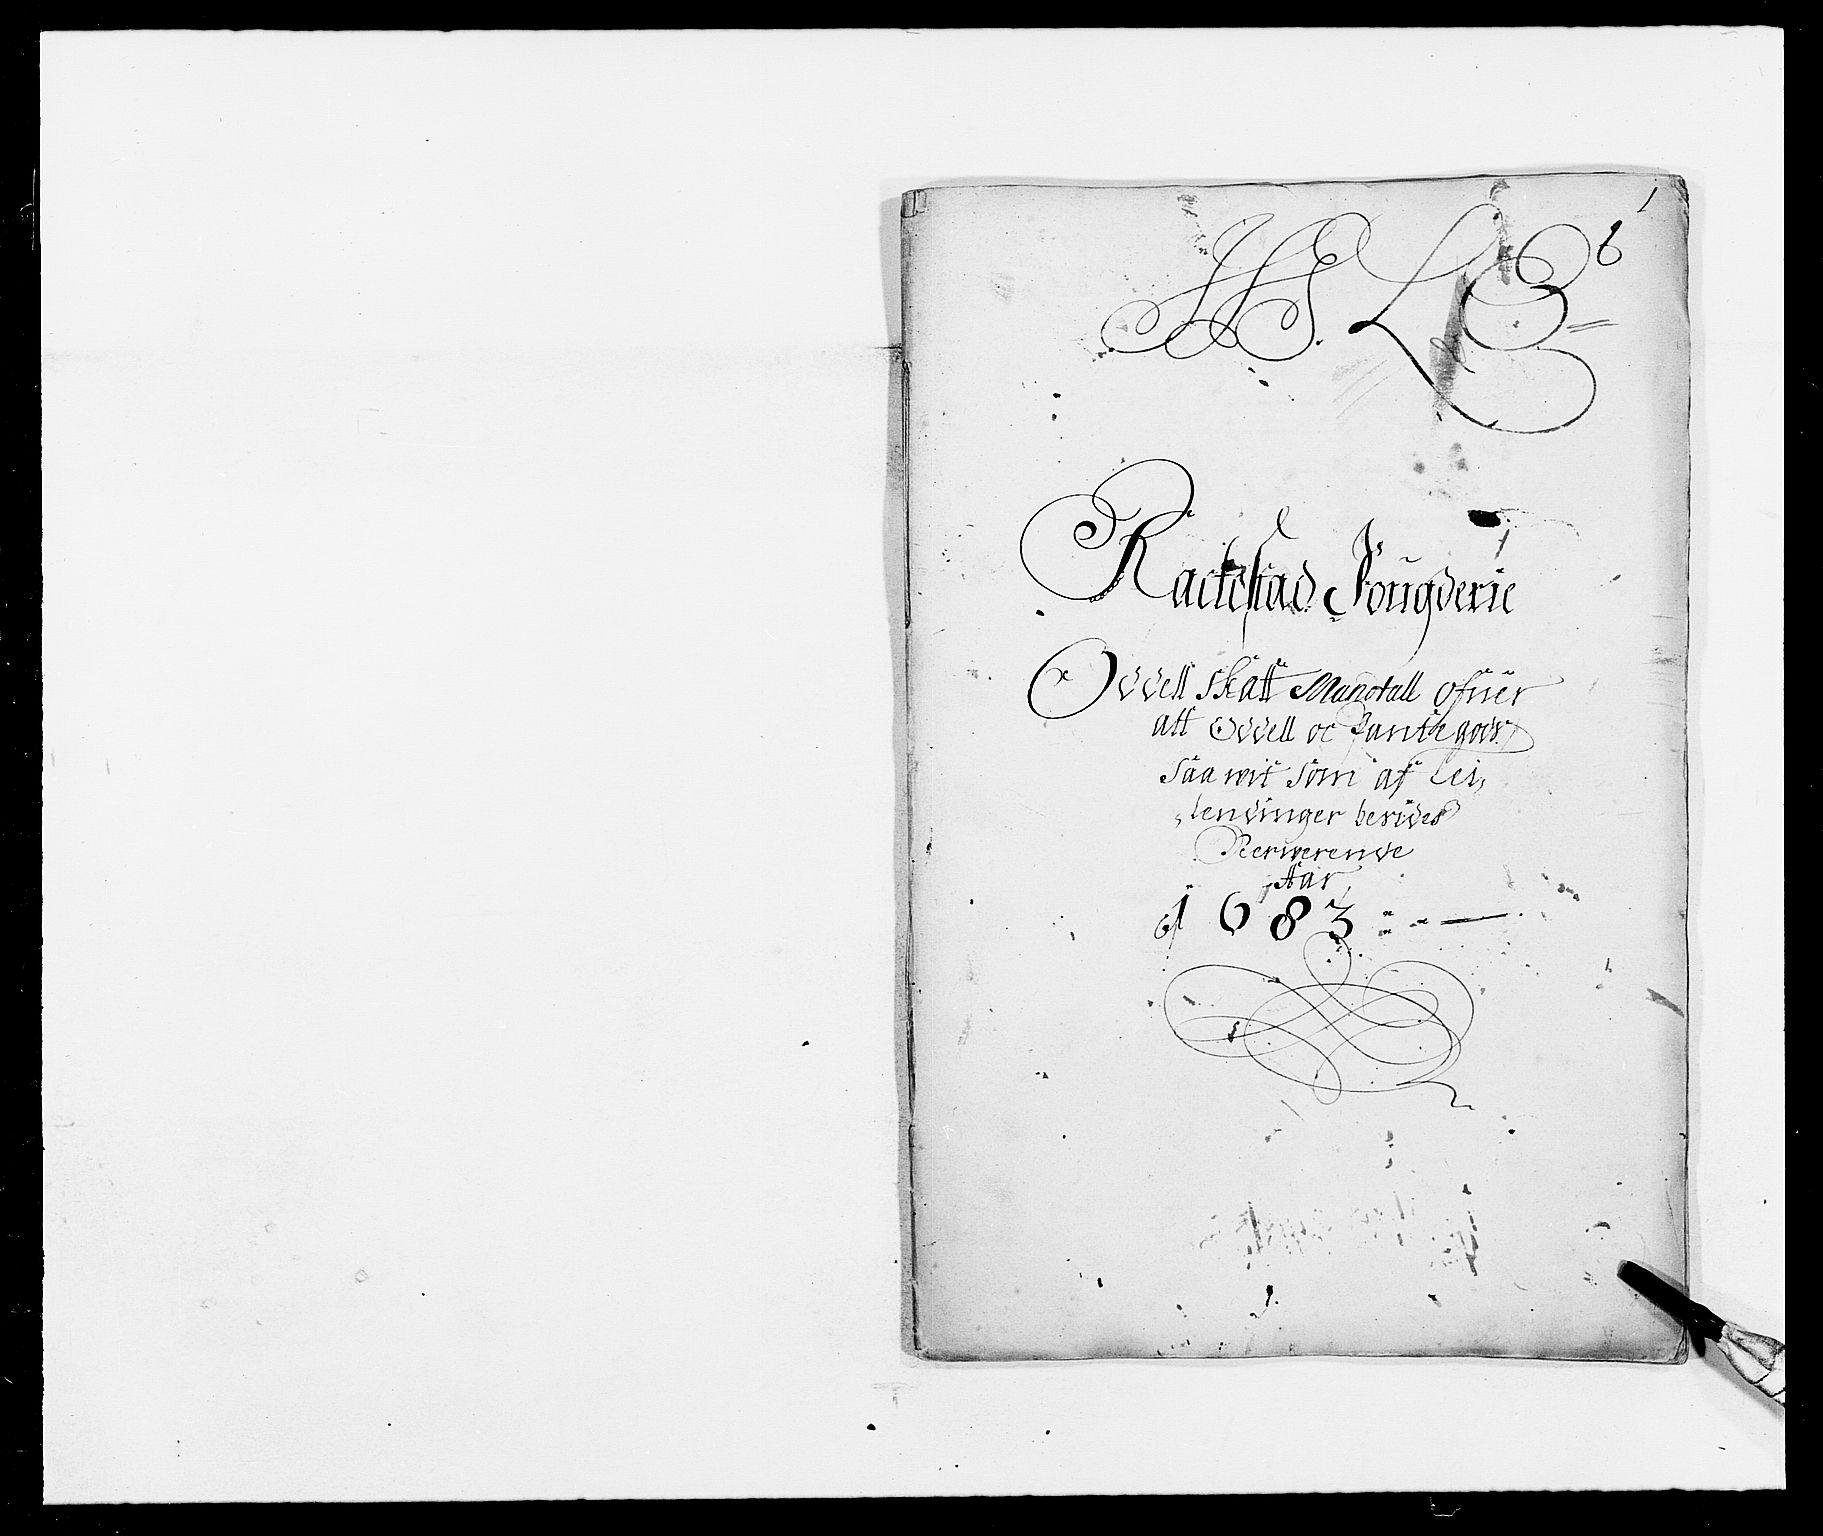 RA, Rentekammeret inntil 1814, Reviderte regnskaper, Fogderegnskap, R05/L0274: Fogderegnskap Rakkestad, 1683-1684, s. 126